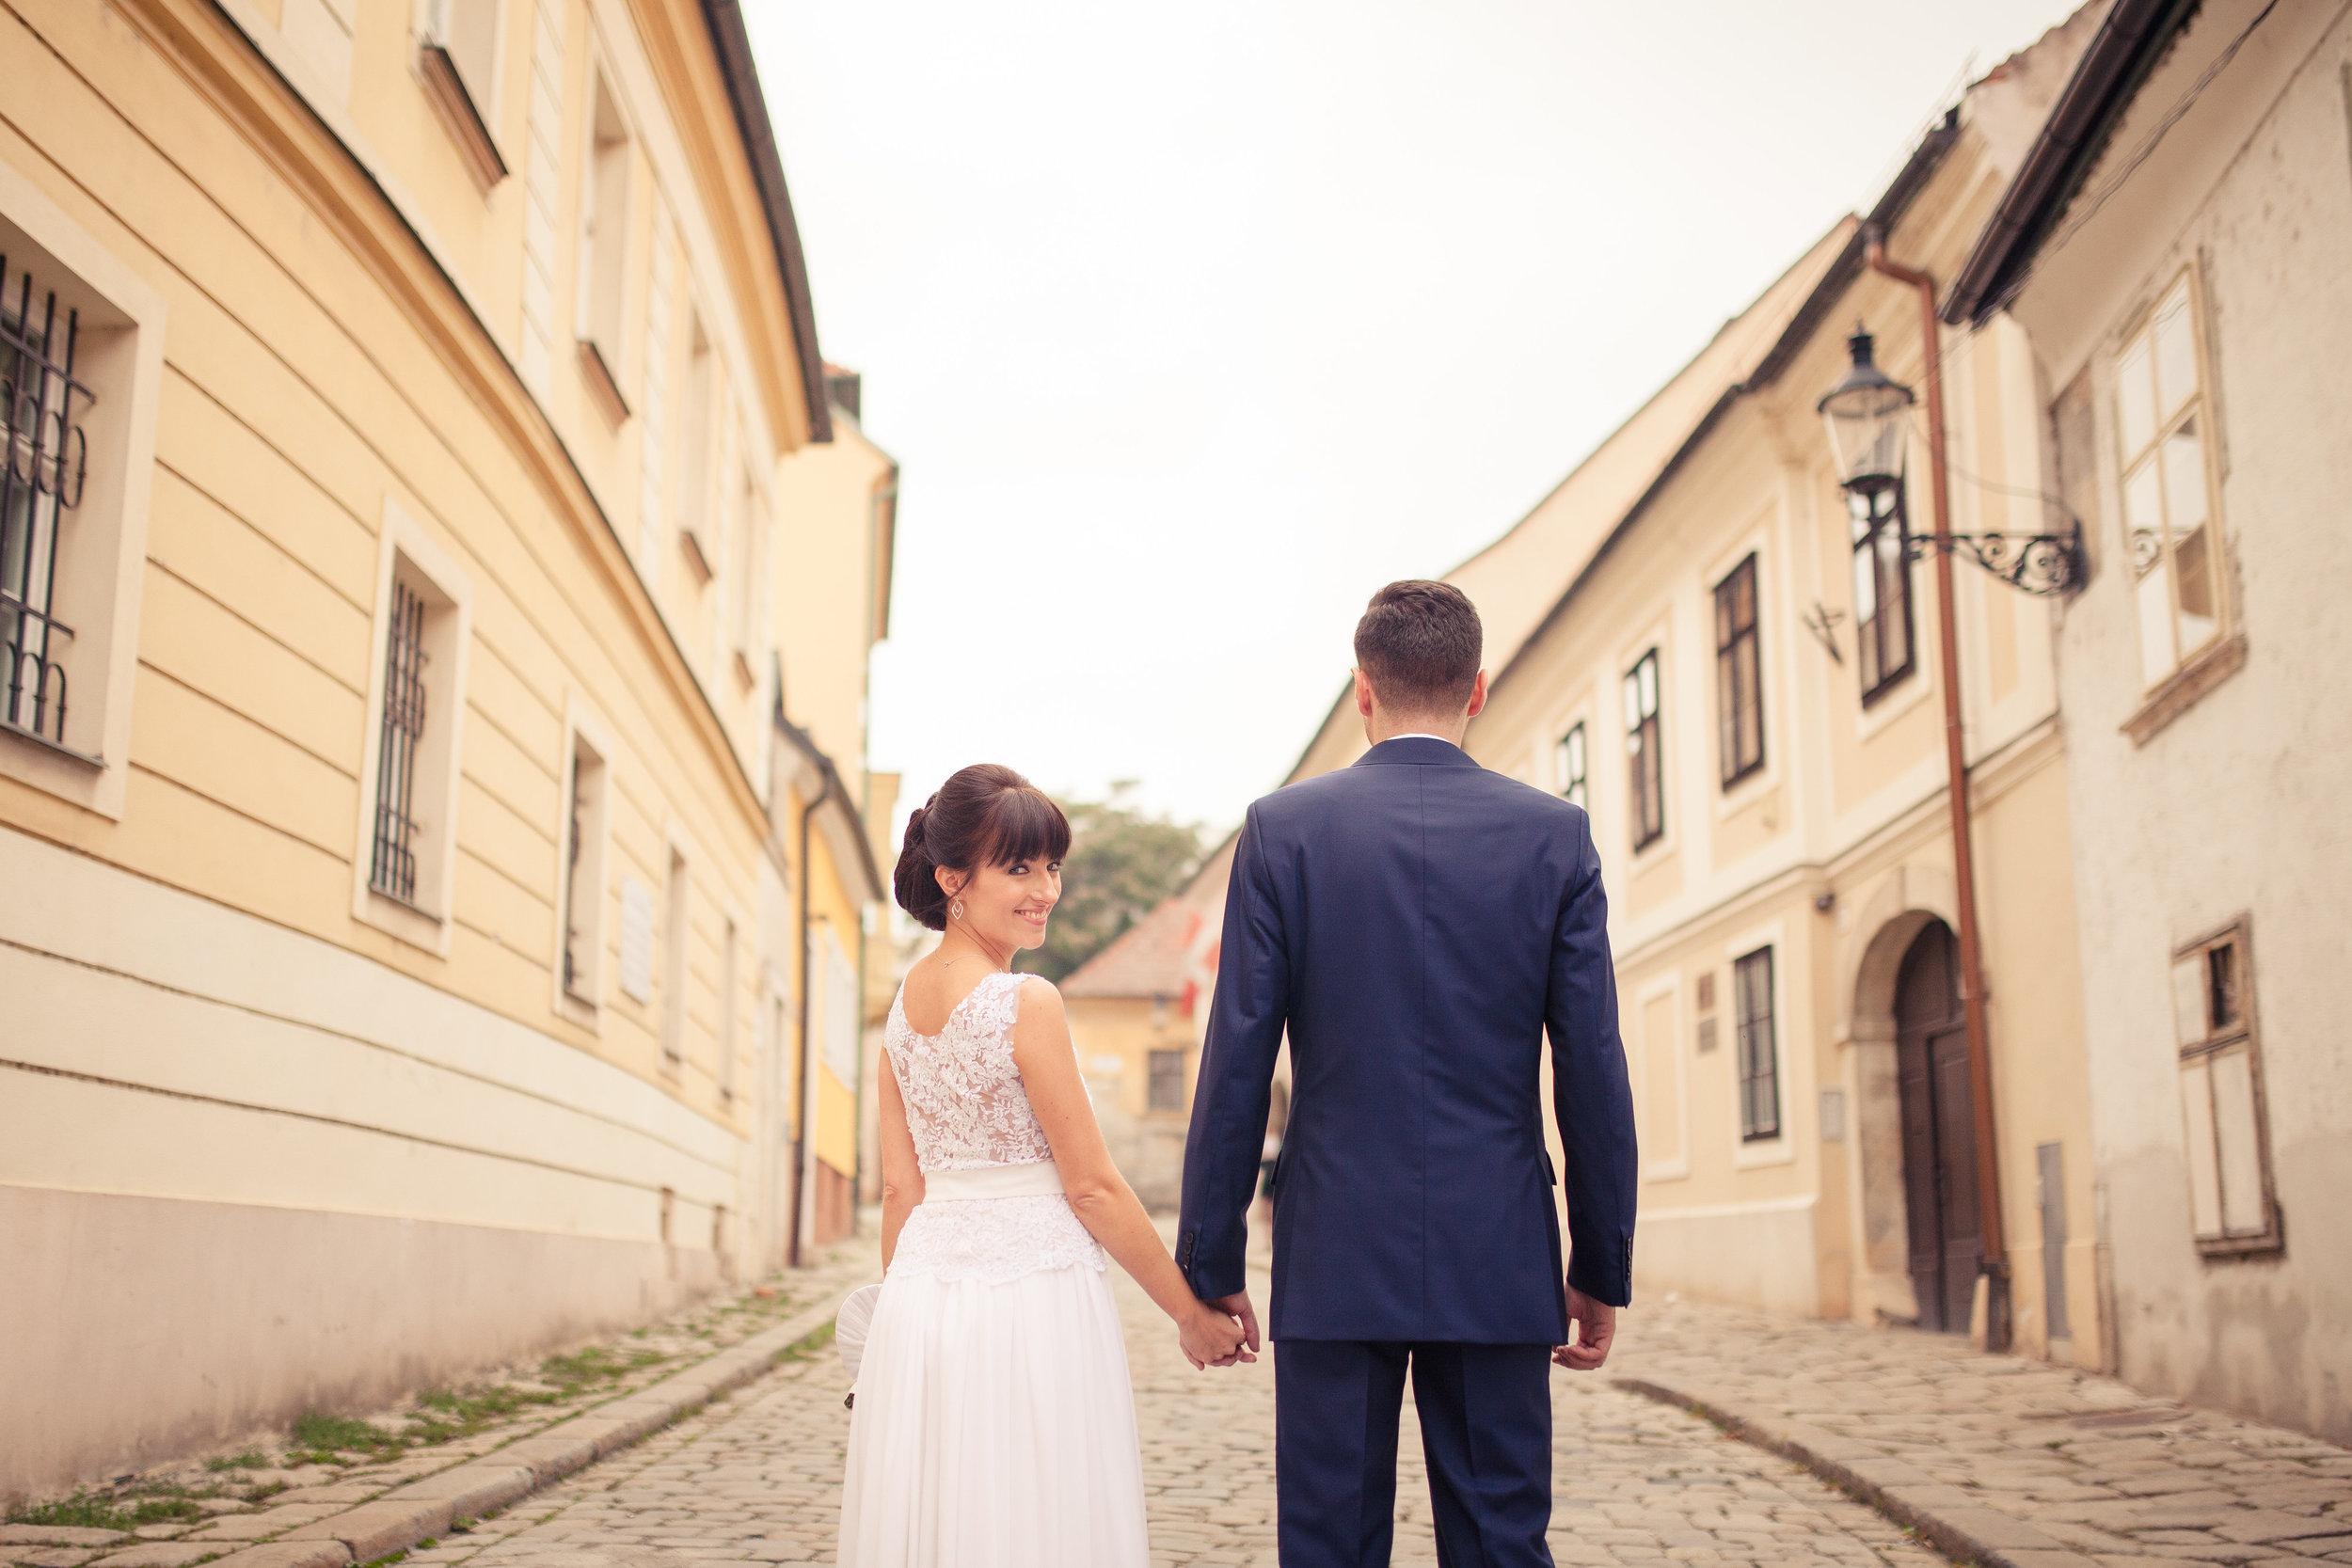 destination-wedding-photographer-bratislava-slovakia-europe-portrait-session-bride-groom.jpg